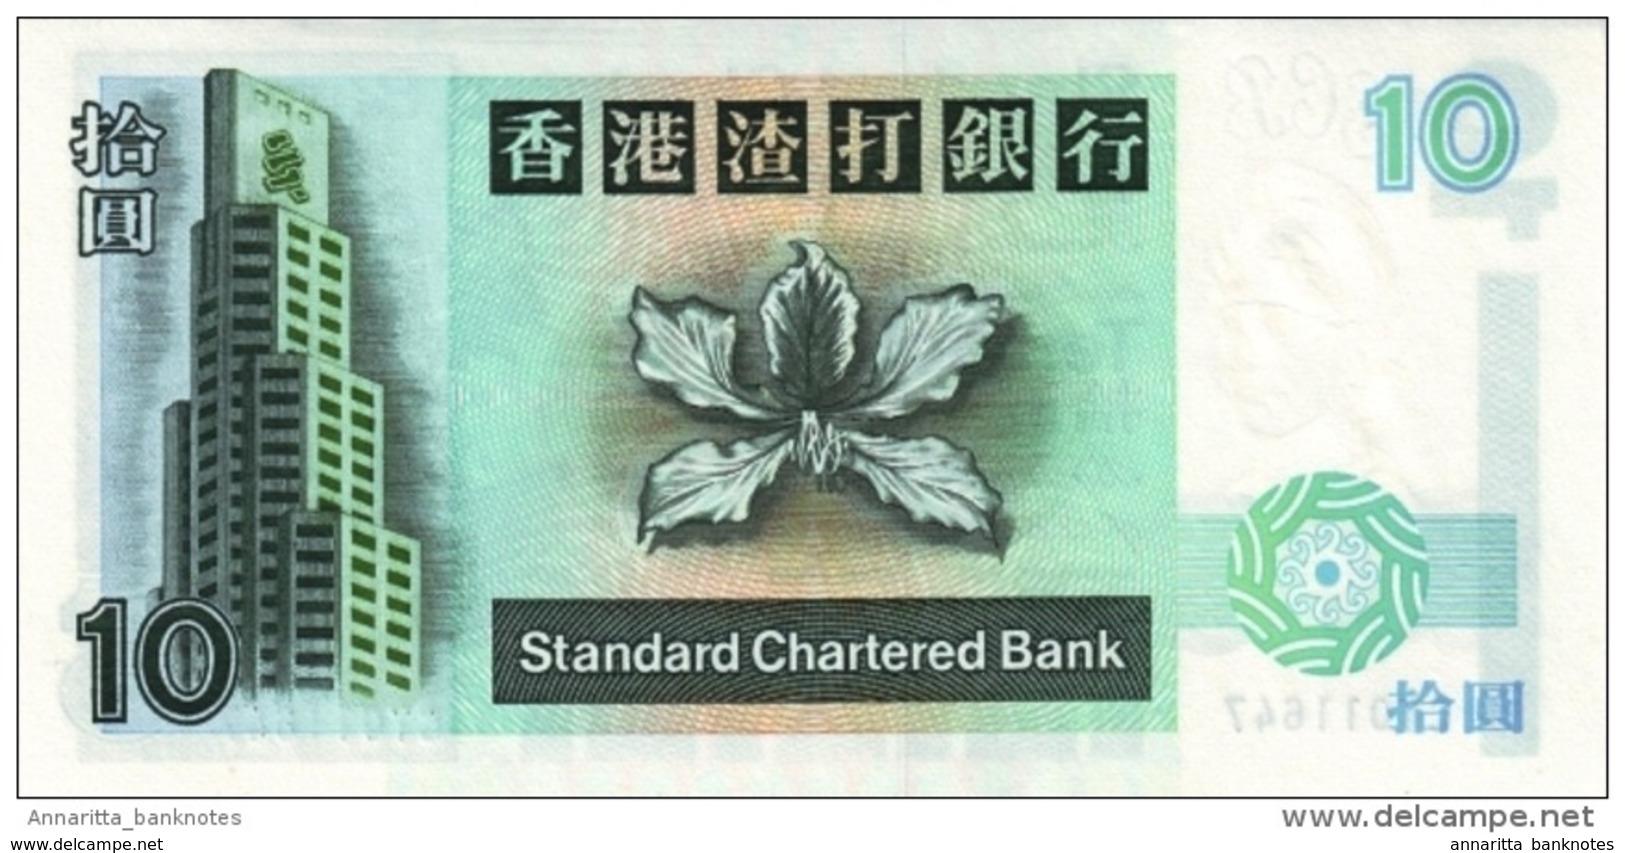 HONG KONG 10 DOLLARS 1995 P-284a UNC [HK407c] - Hong Kong